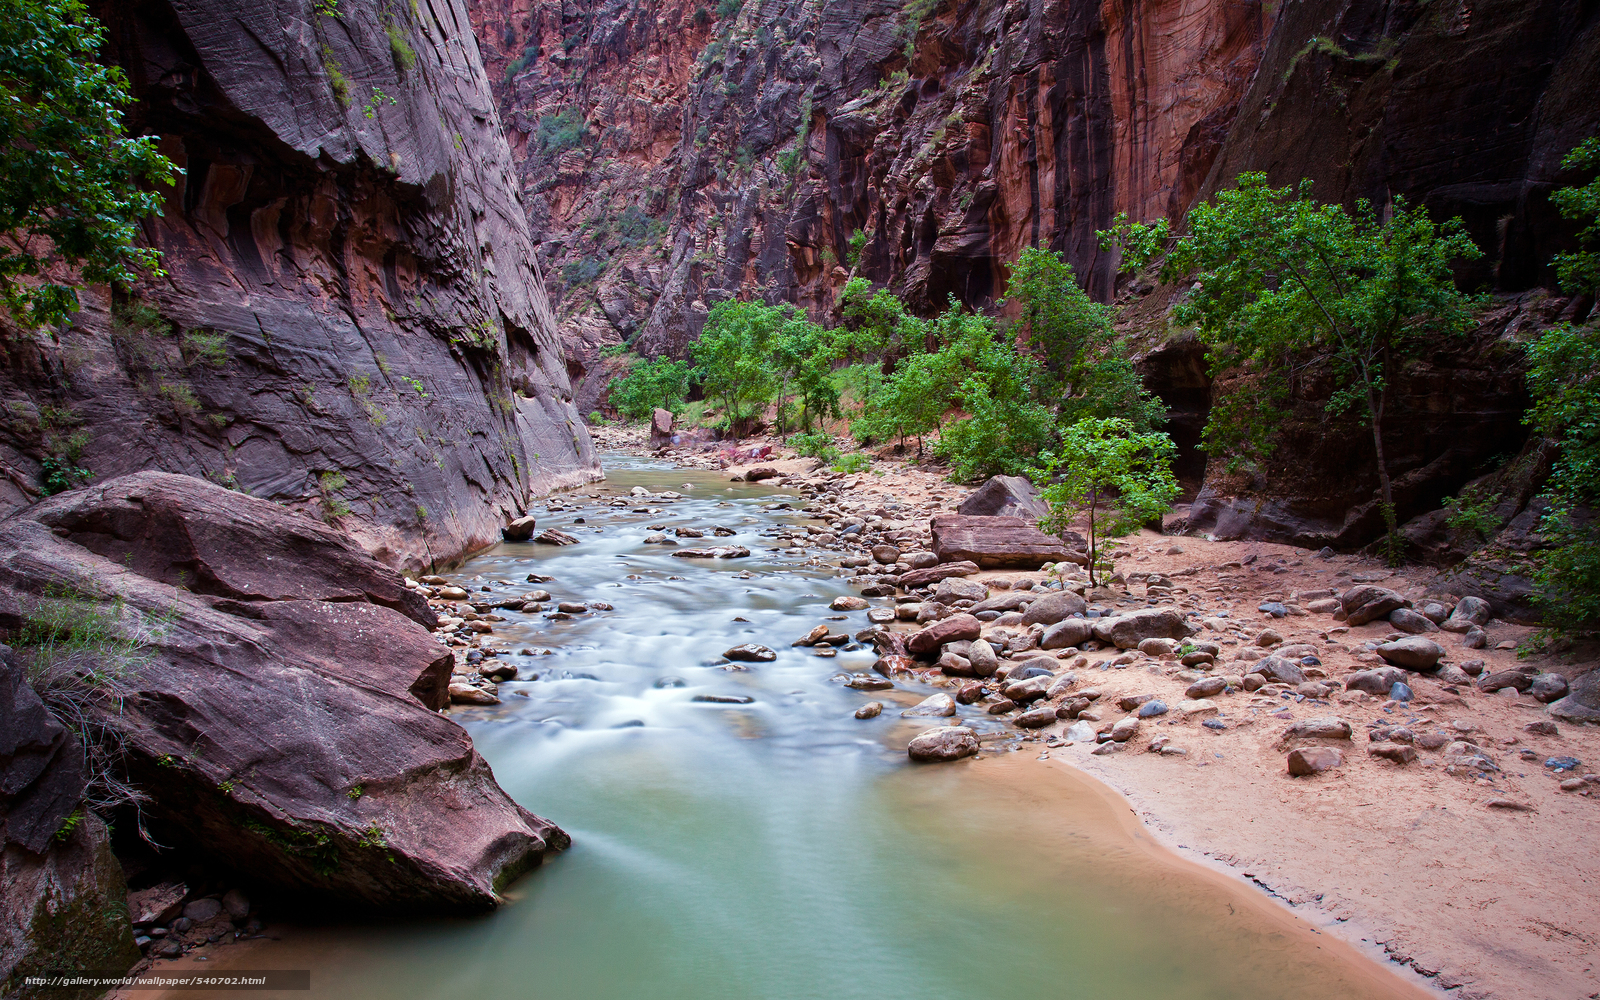 wallpaper Zion National Park Rocks river nature desktop 1600x1000